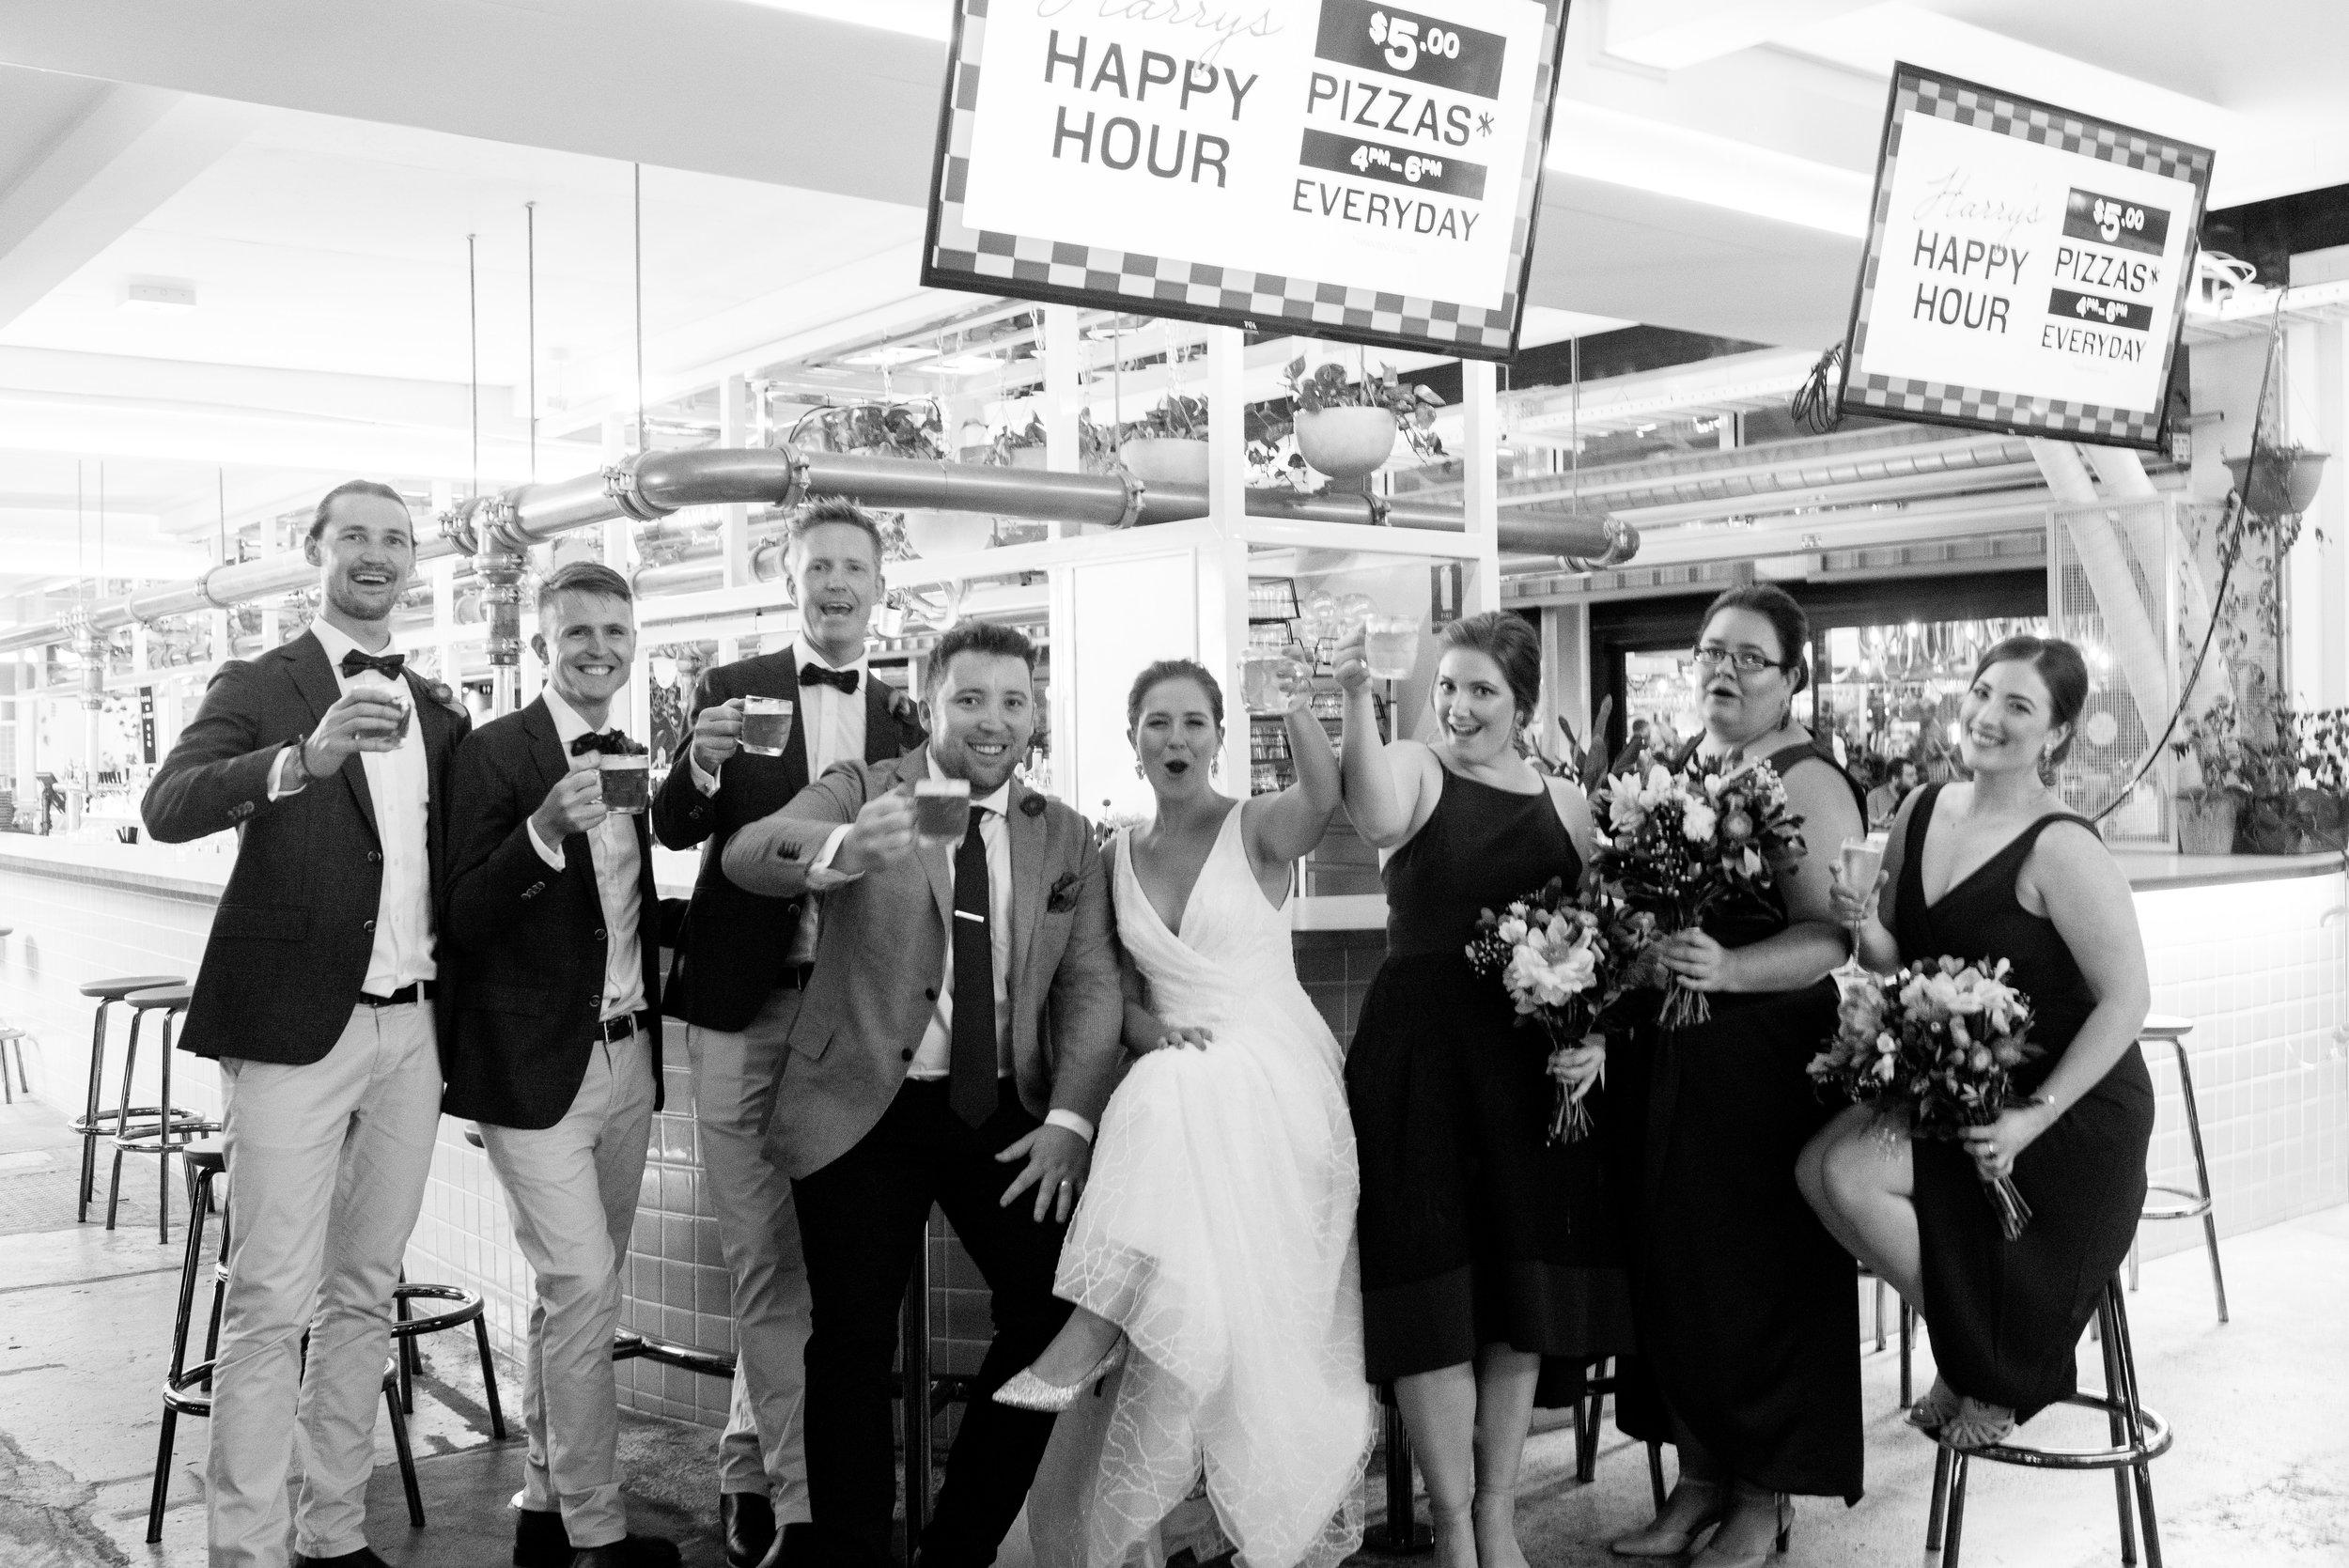 refinery-wedding-brisbane-city-wedding-photographer-79.jpg